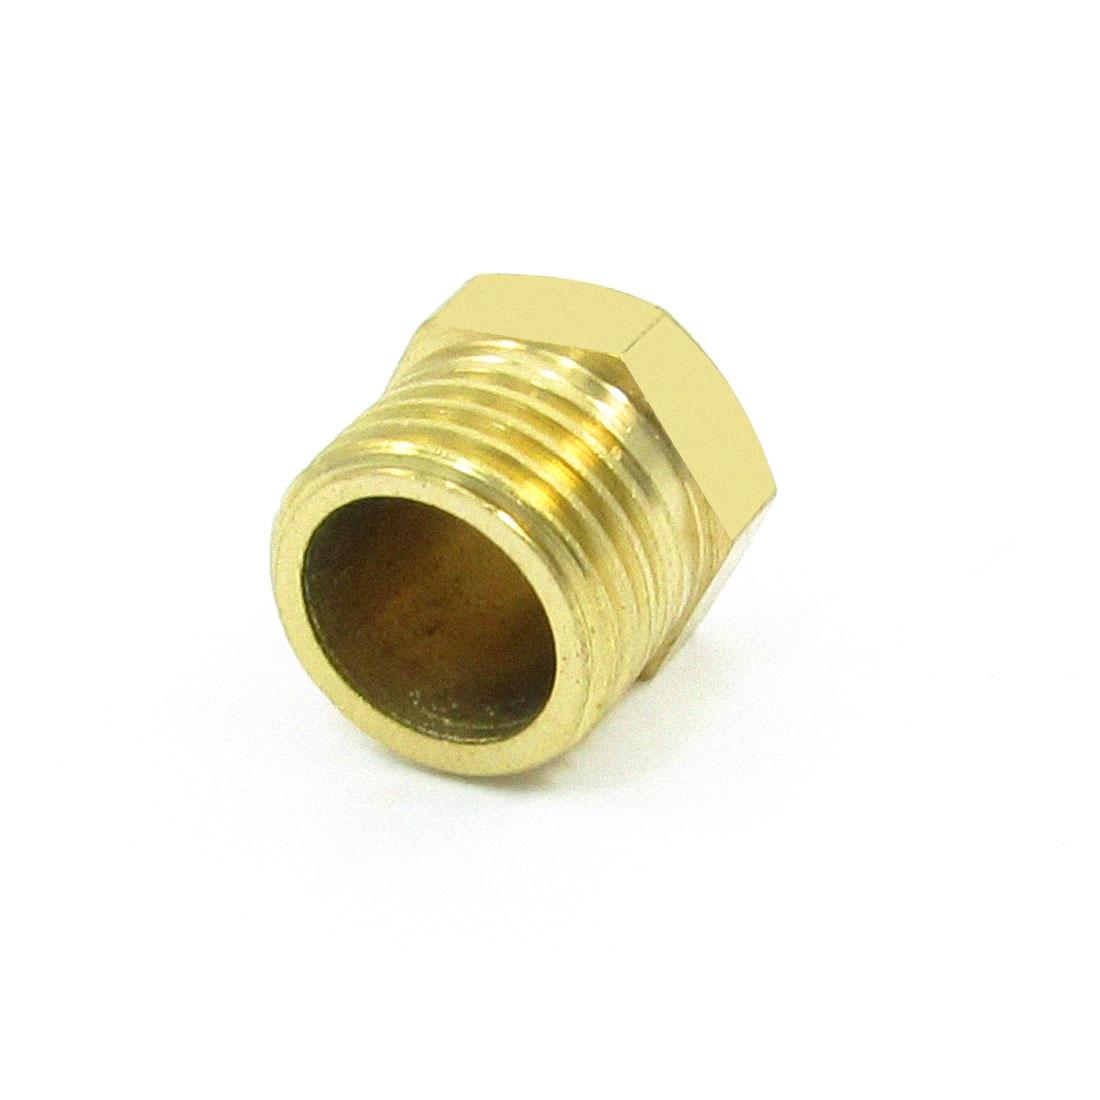 "1/4"" PT Threaded Diameter Brass Internal Hex Head Pipe Connector Gold Tone"